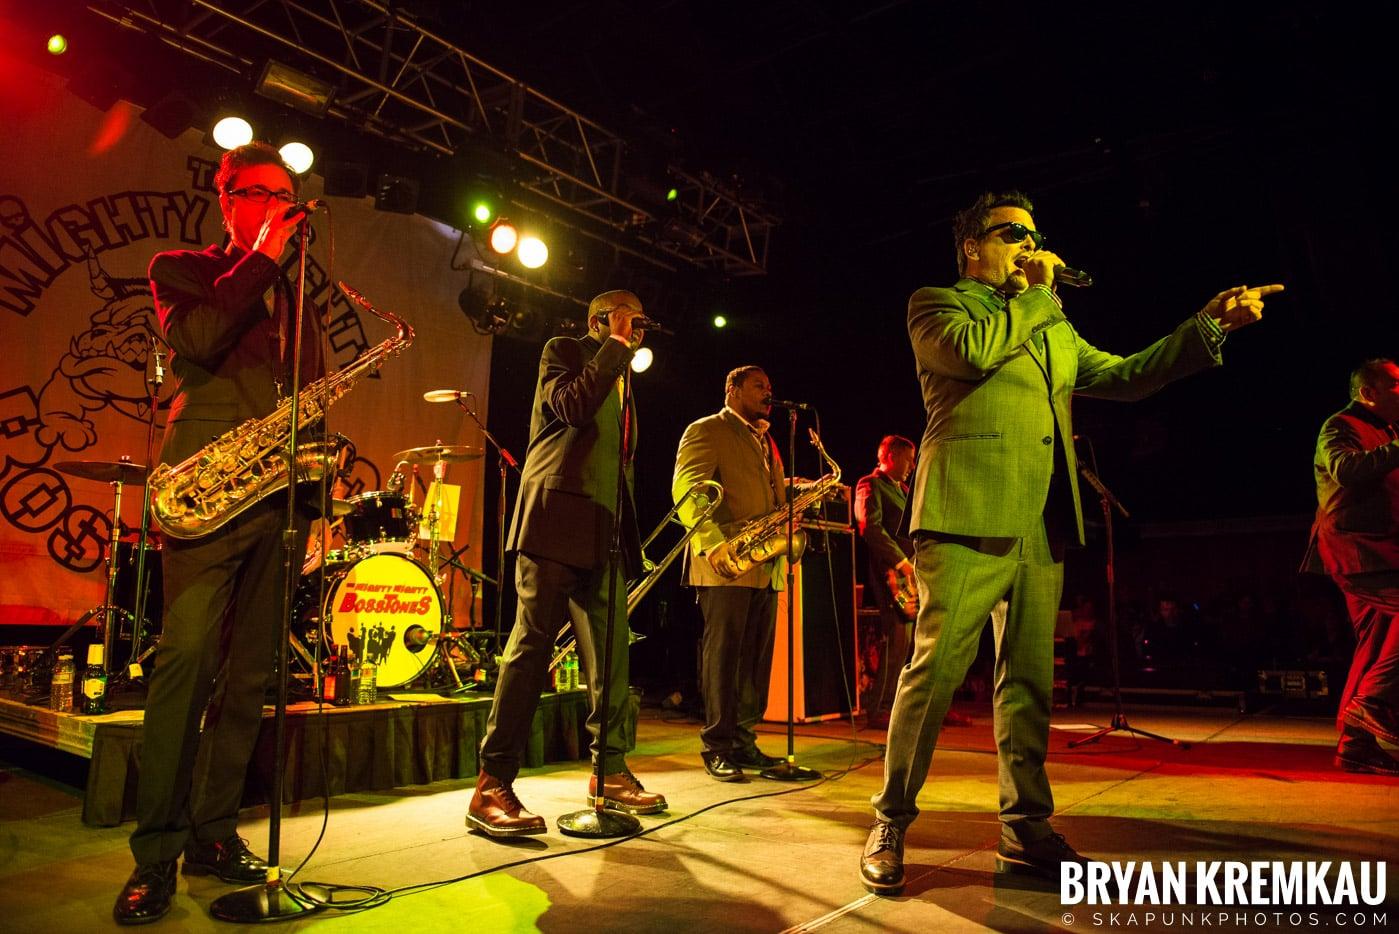 Mighty Mighty Bosstones @ Starland Ballroom, Sayreville, NJ - 7.29.17 (1)